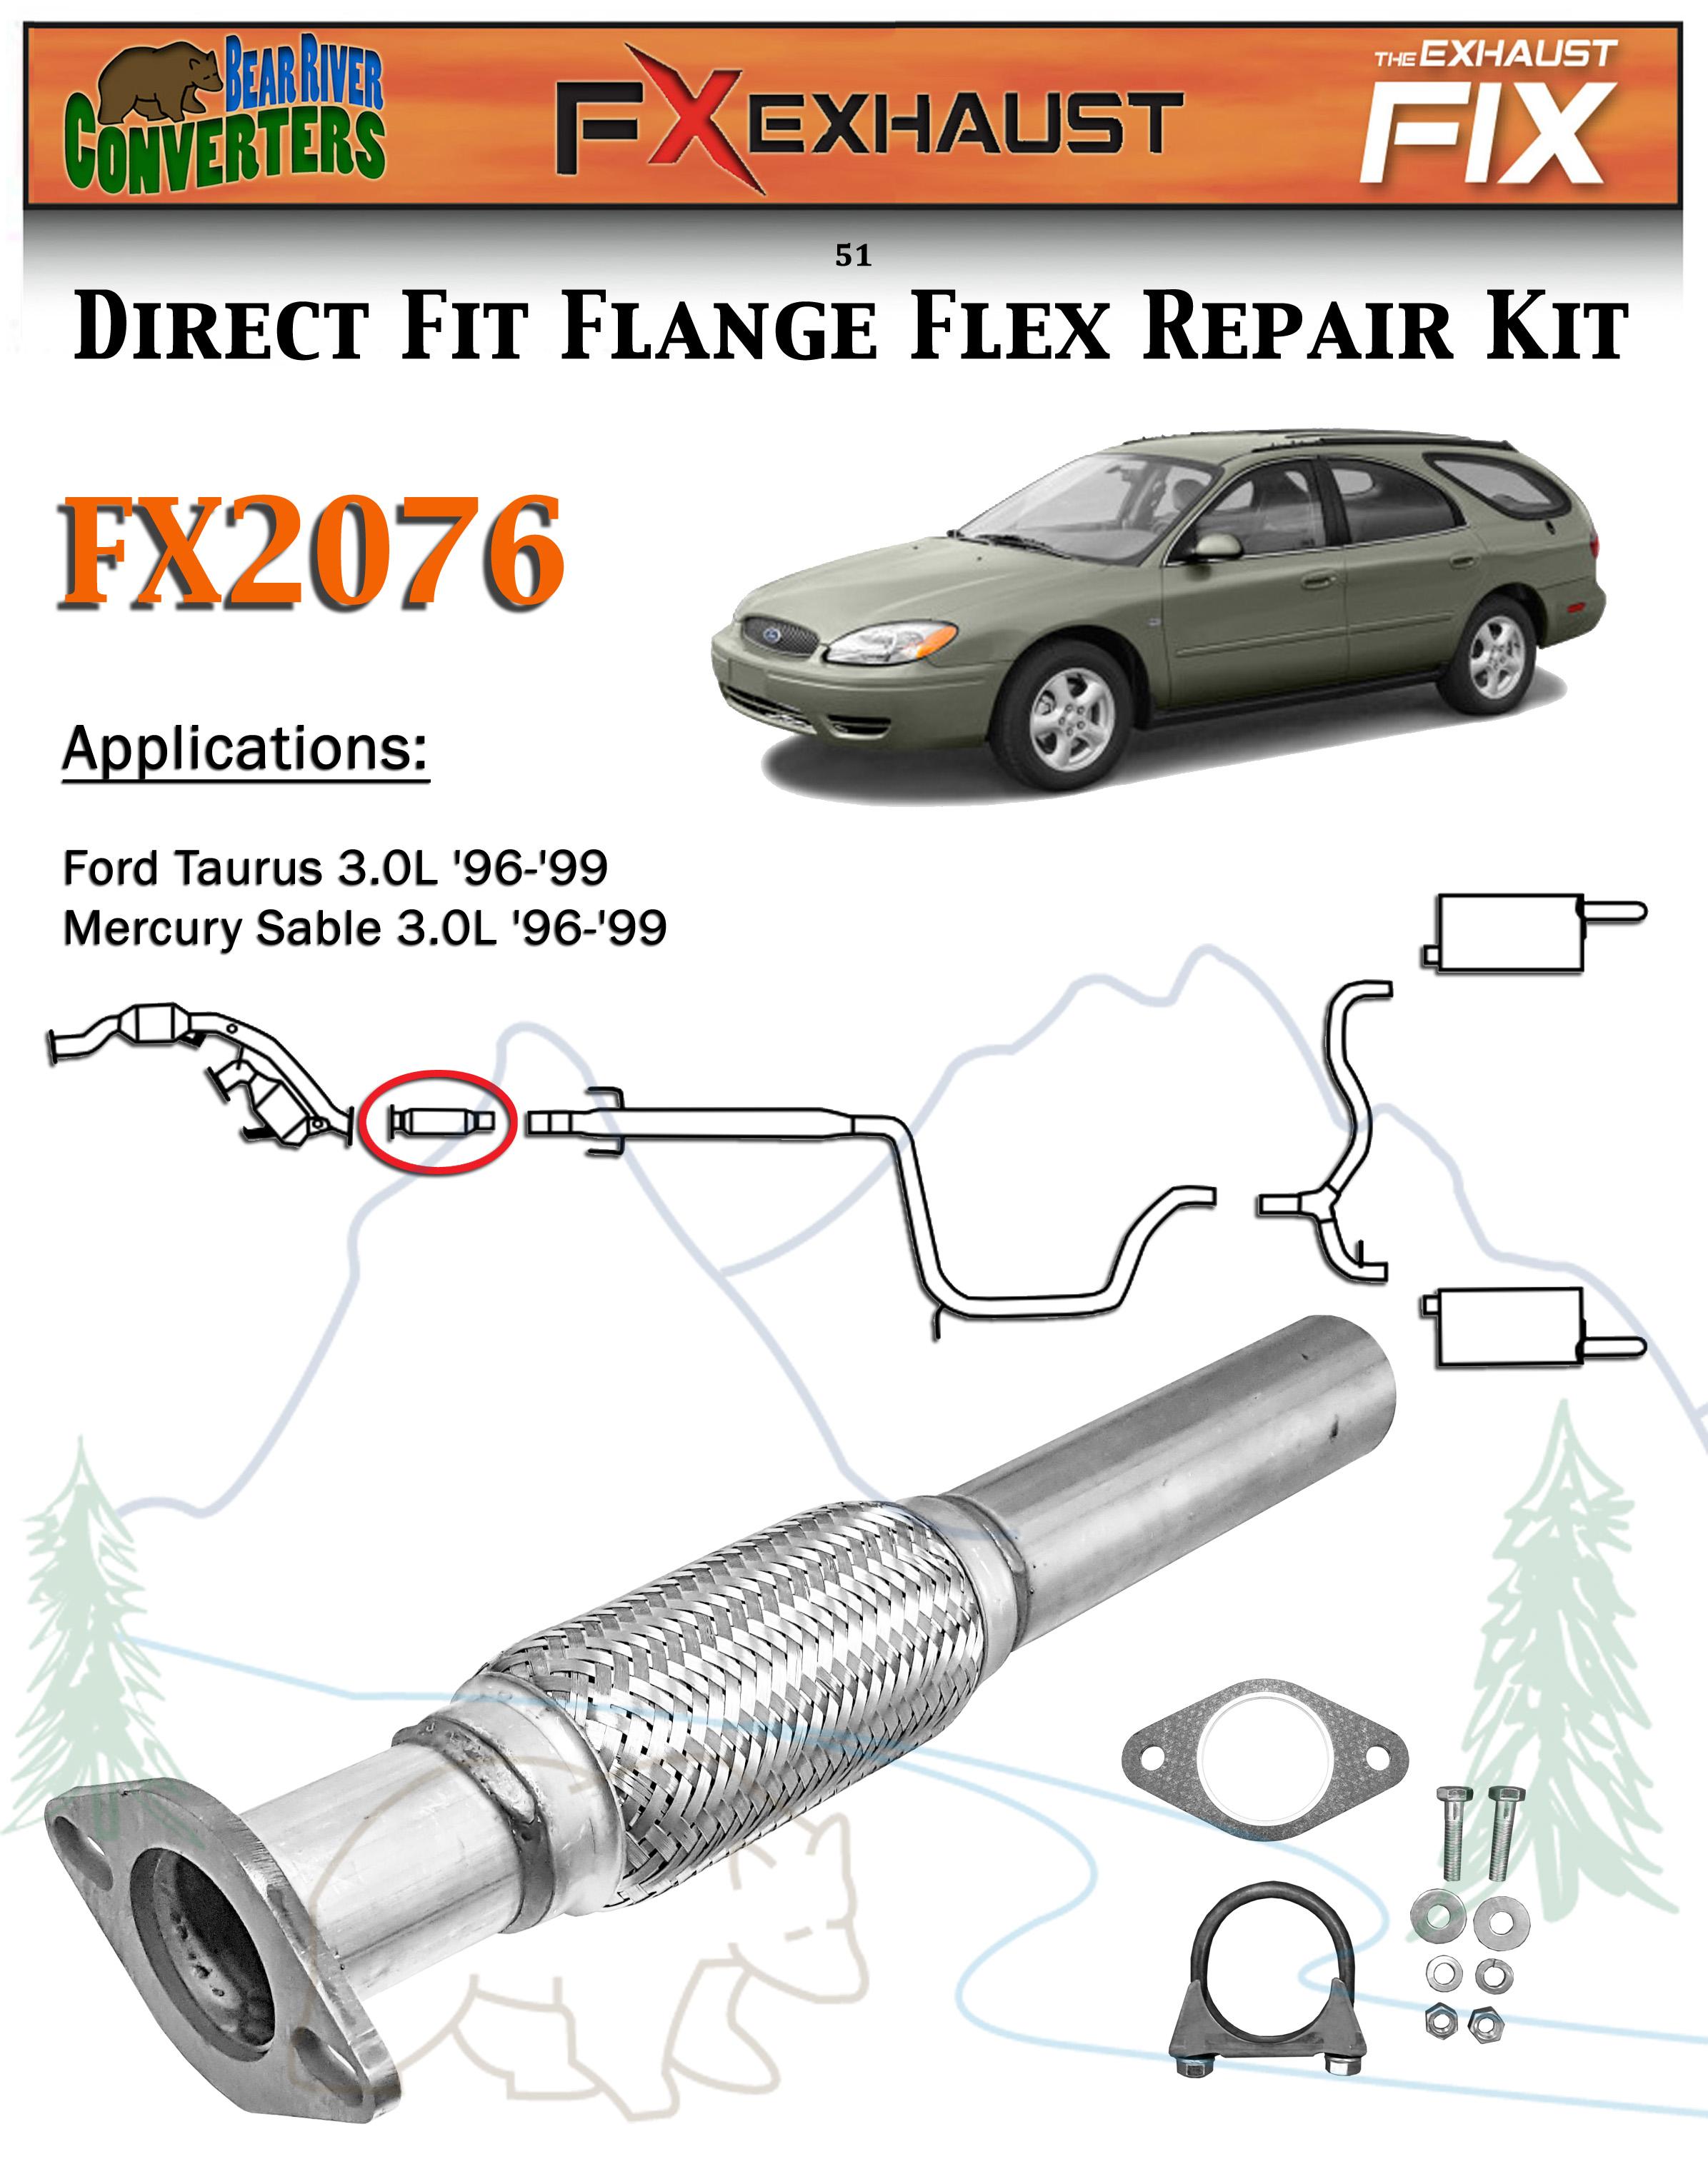 Exhaust Pipe-DOHC FX Exhaust FX2076